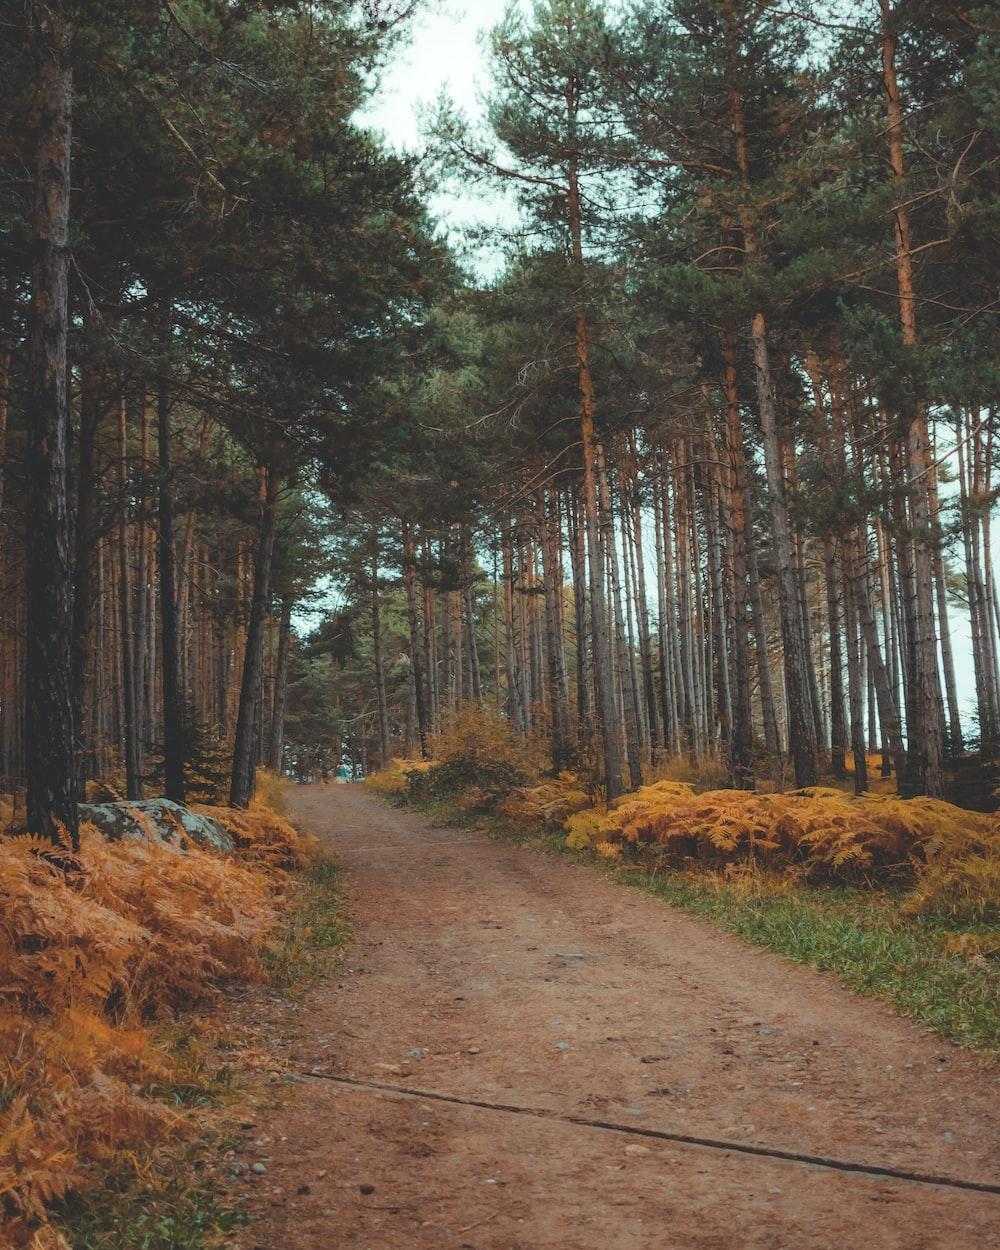 brown dirt road in between trees during daytime